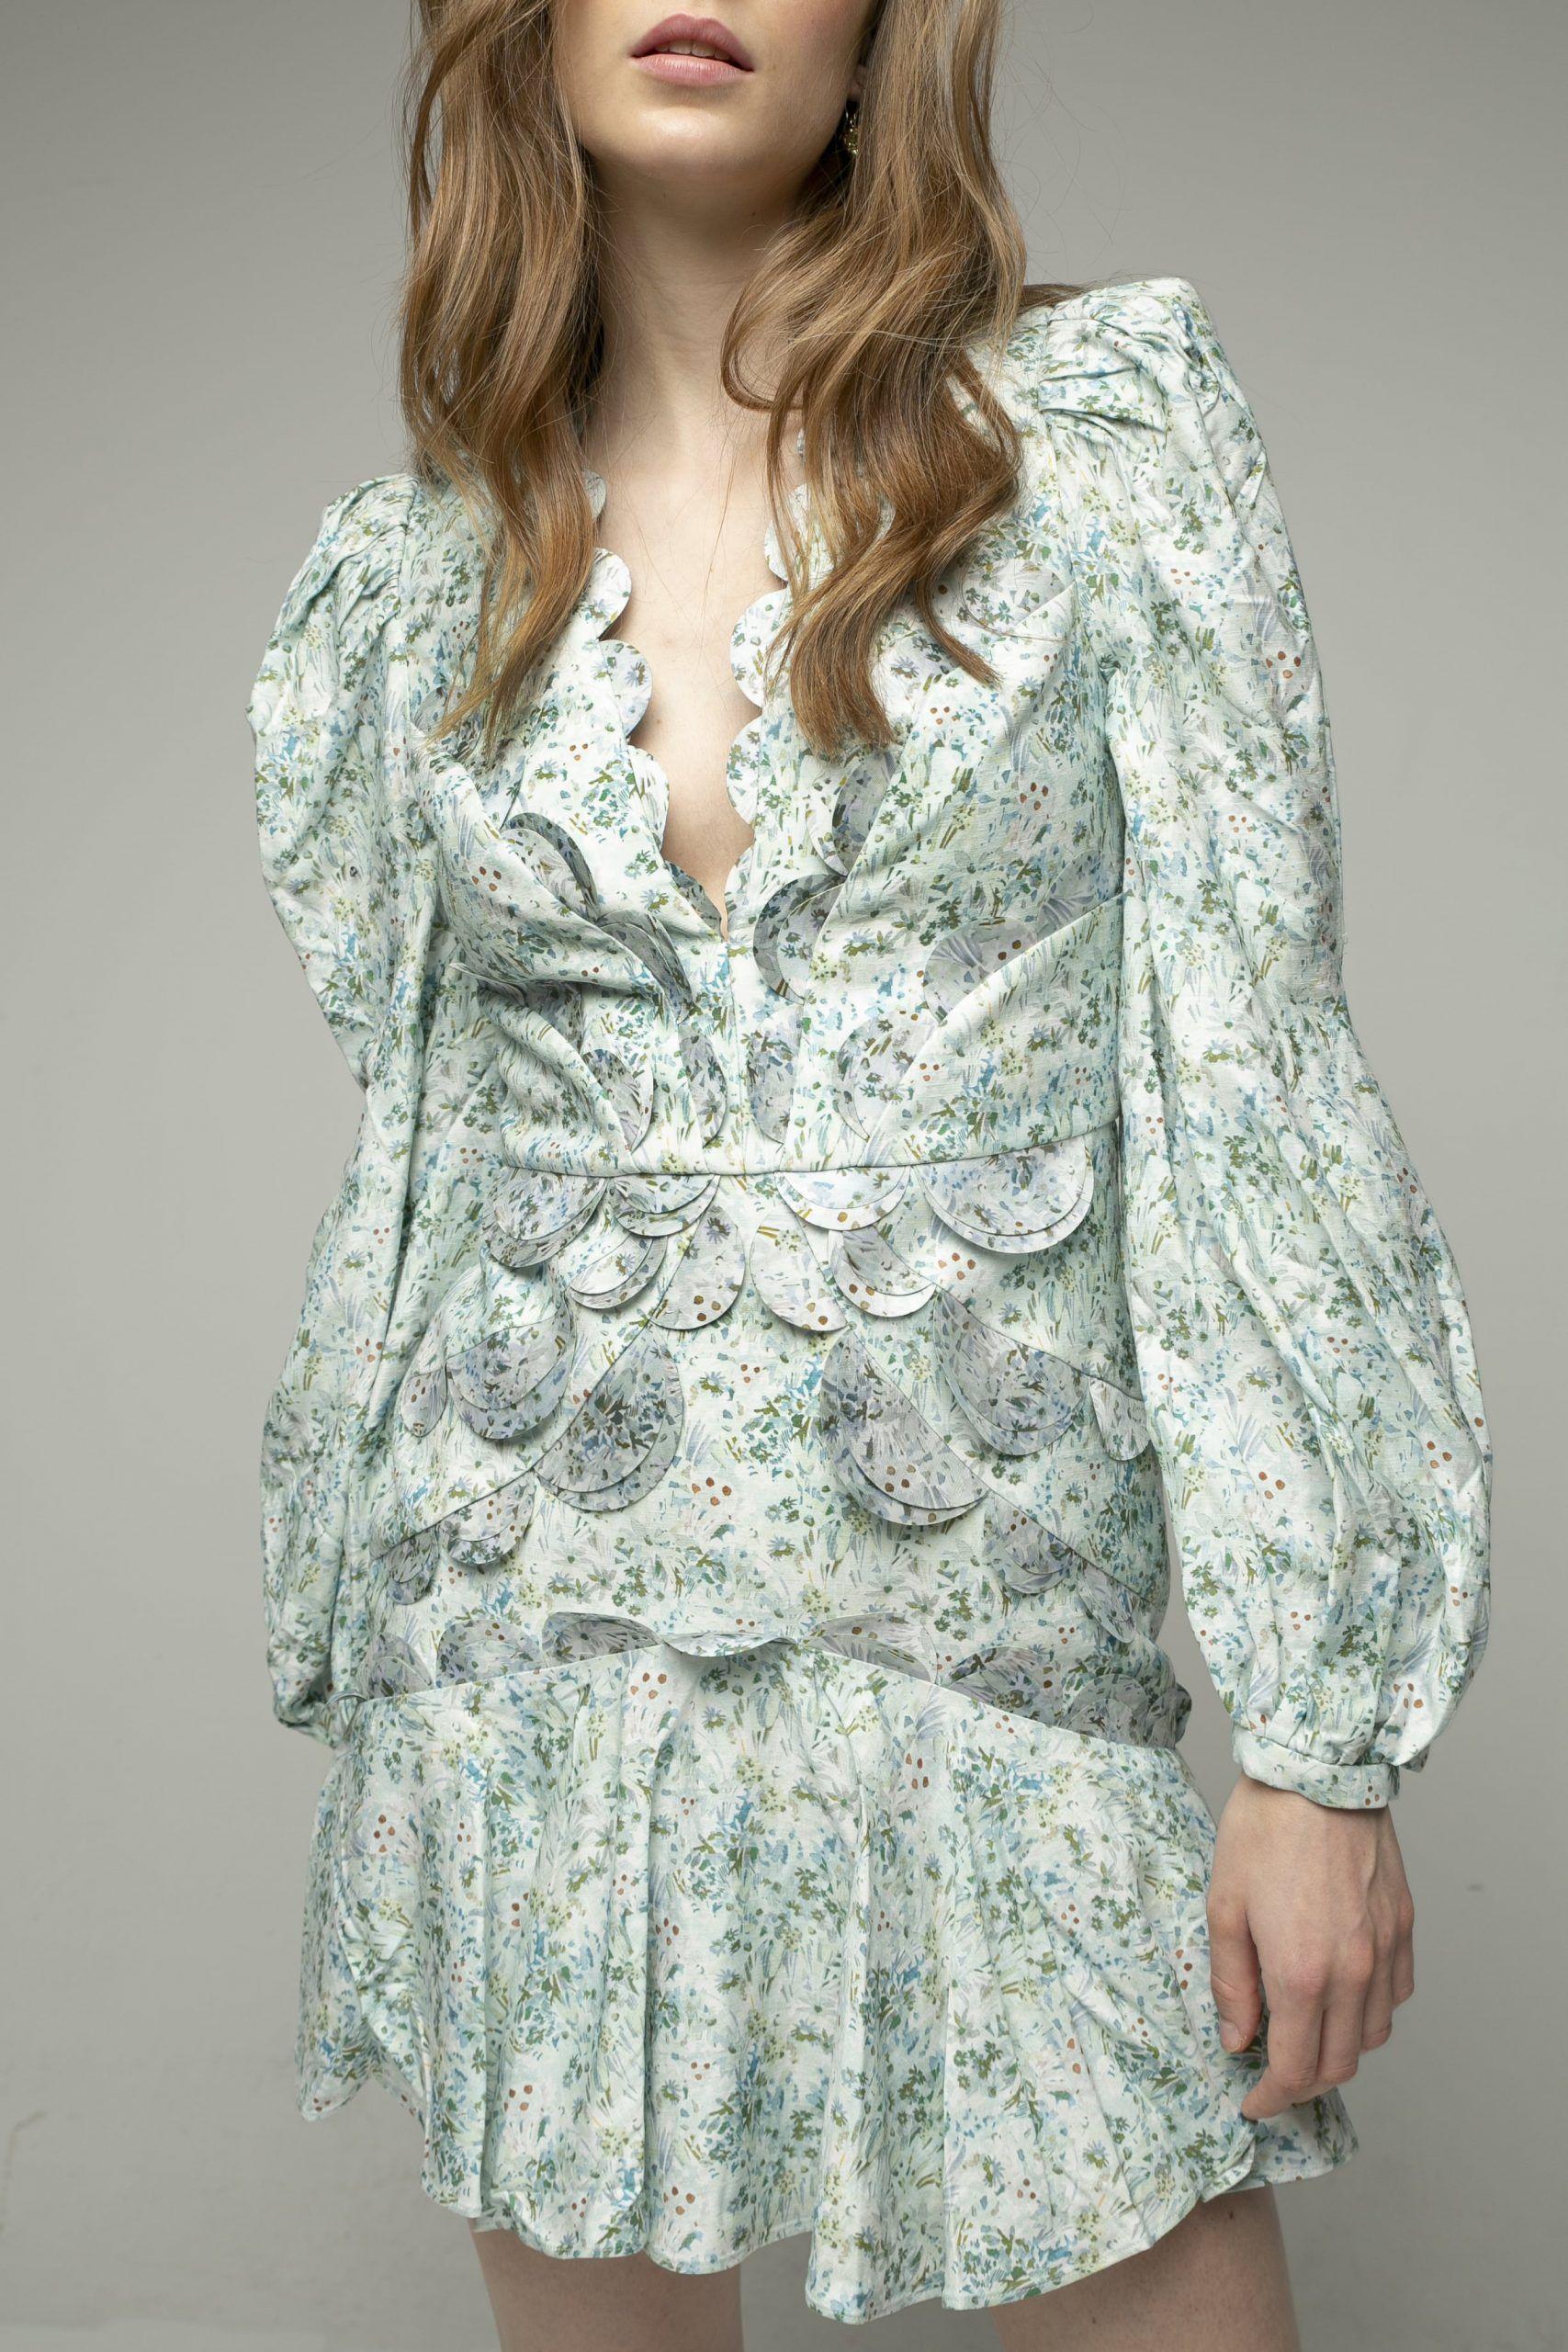 acler-dixon-vestido-corto-azul-florecitas-2